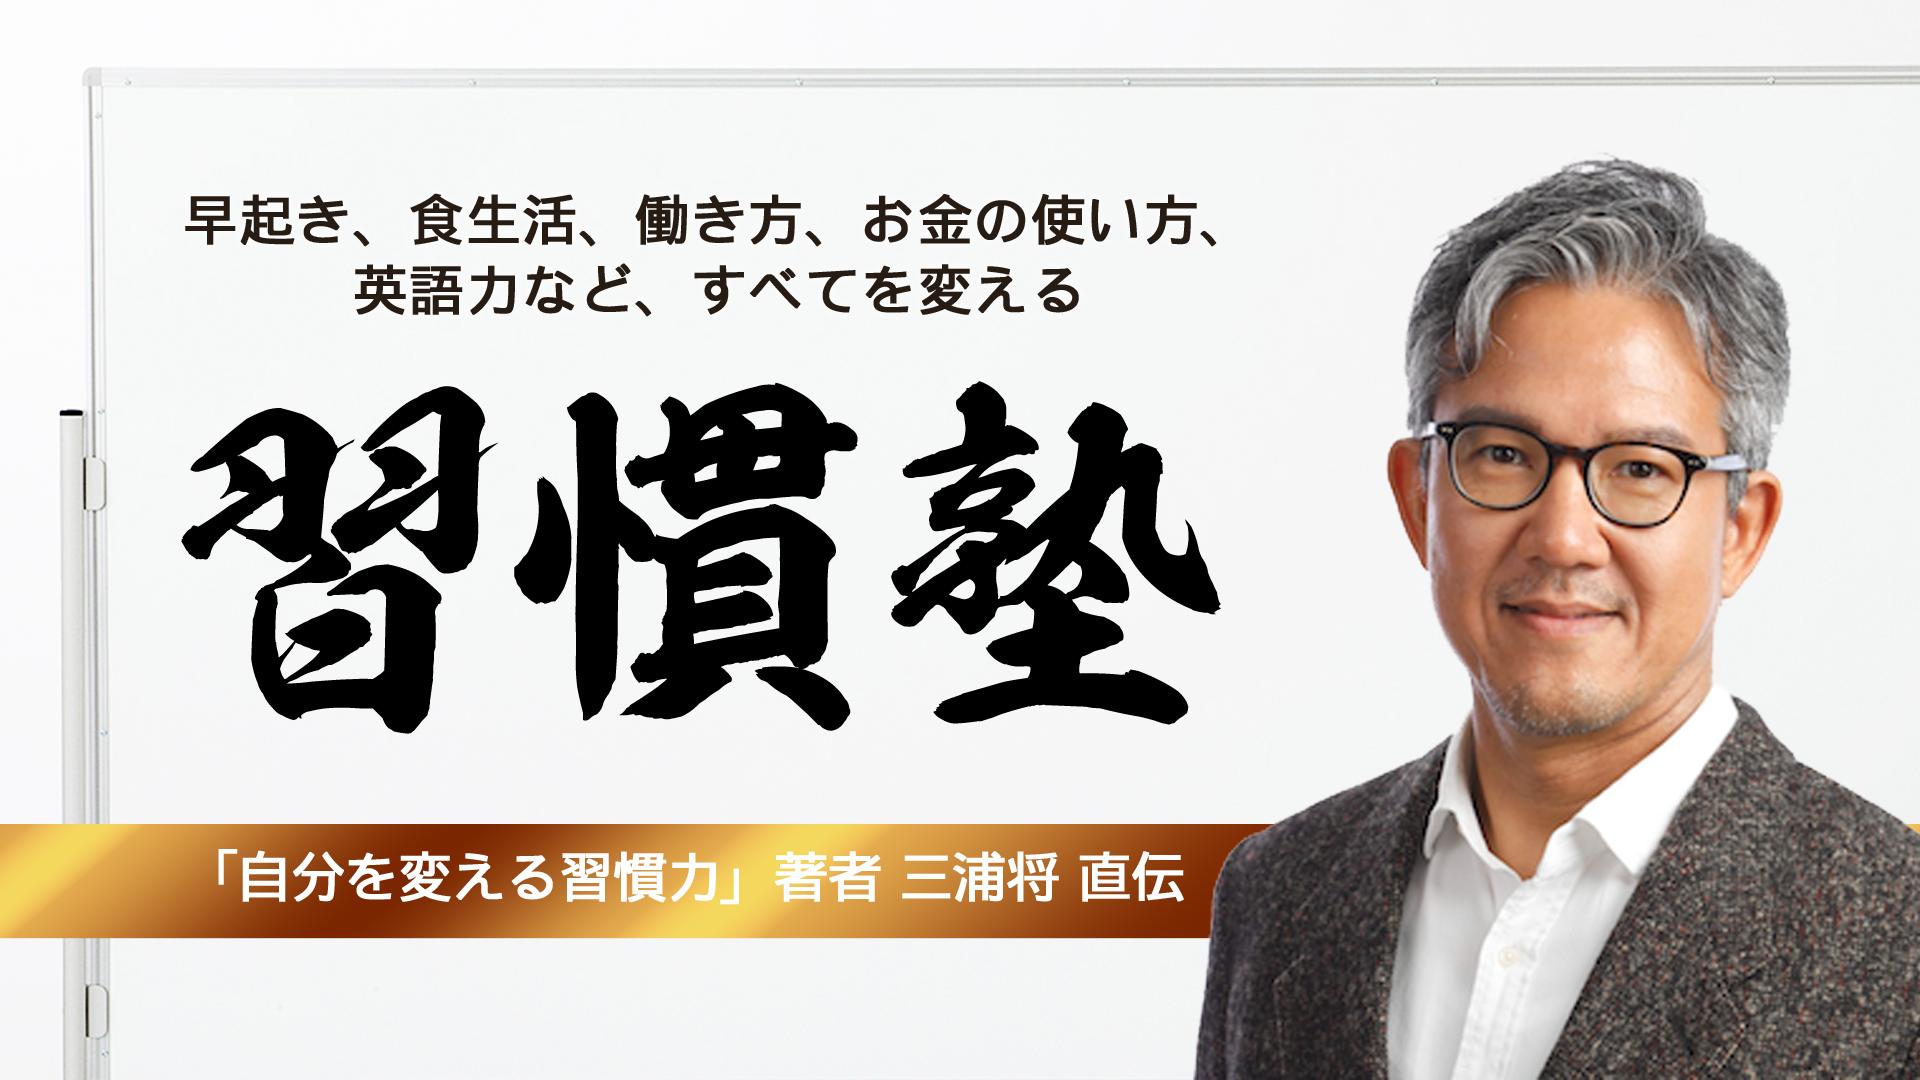 「自分を変える習慣力」 著者三浦将直伝 『習慣塾』